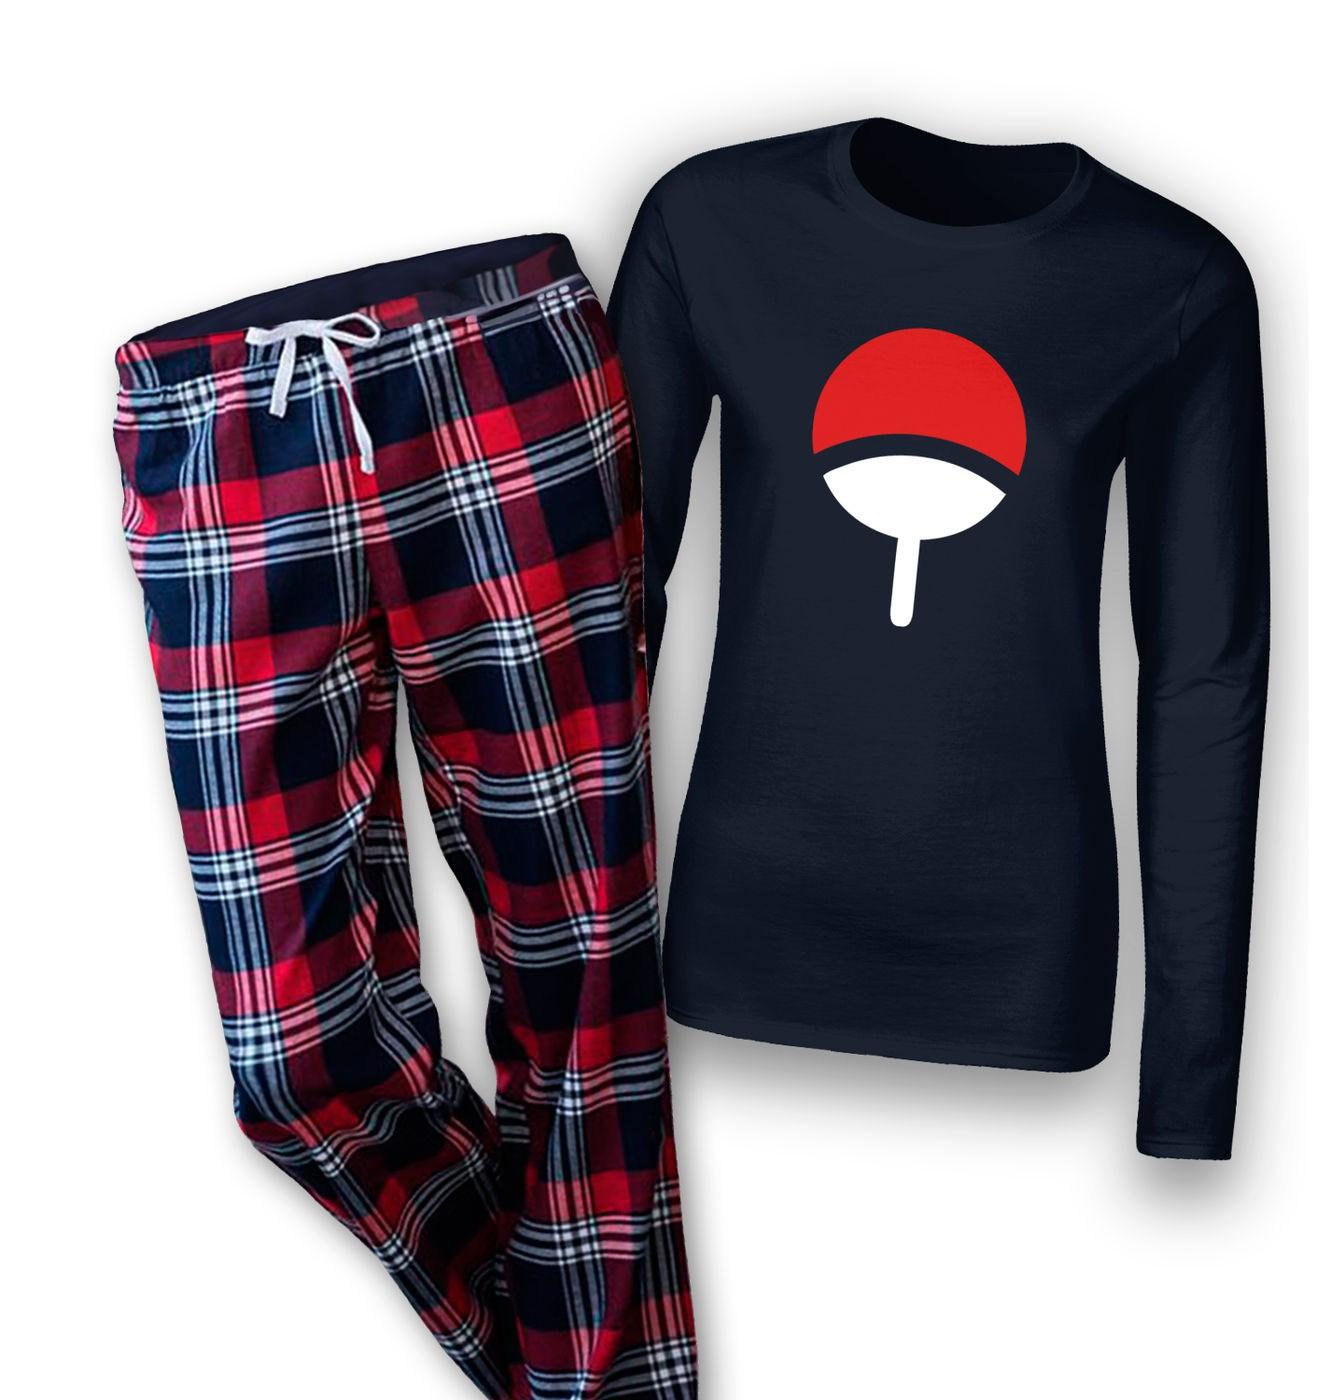 Uchiha Family womens long sleeve pyjamas by Something Geeky